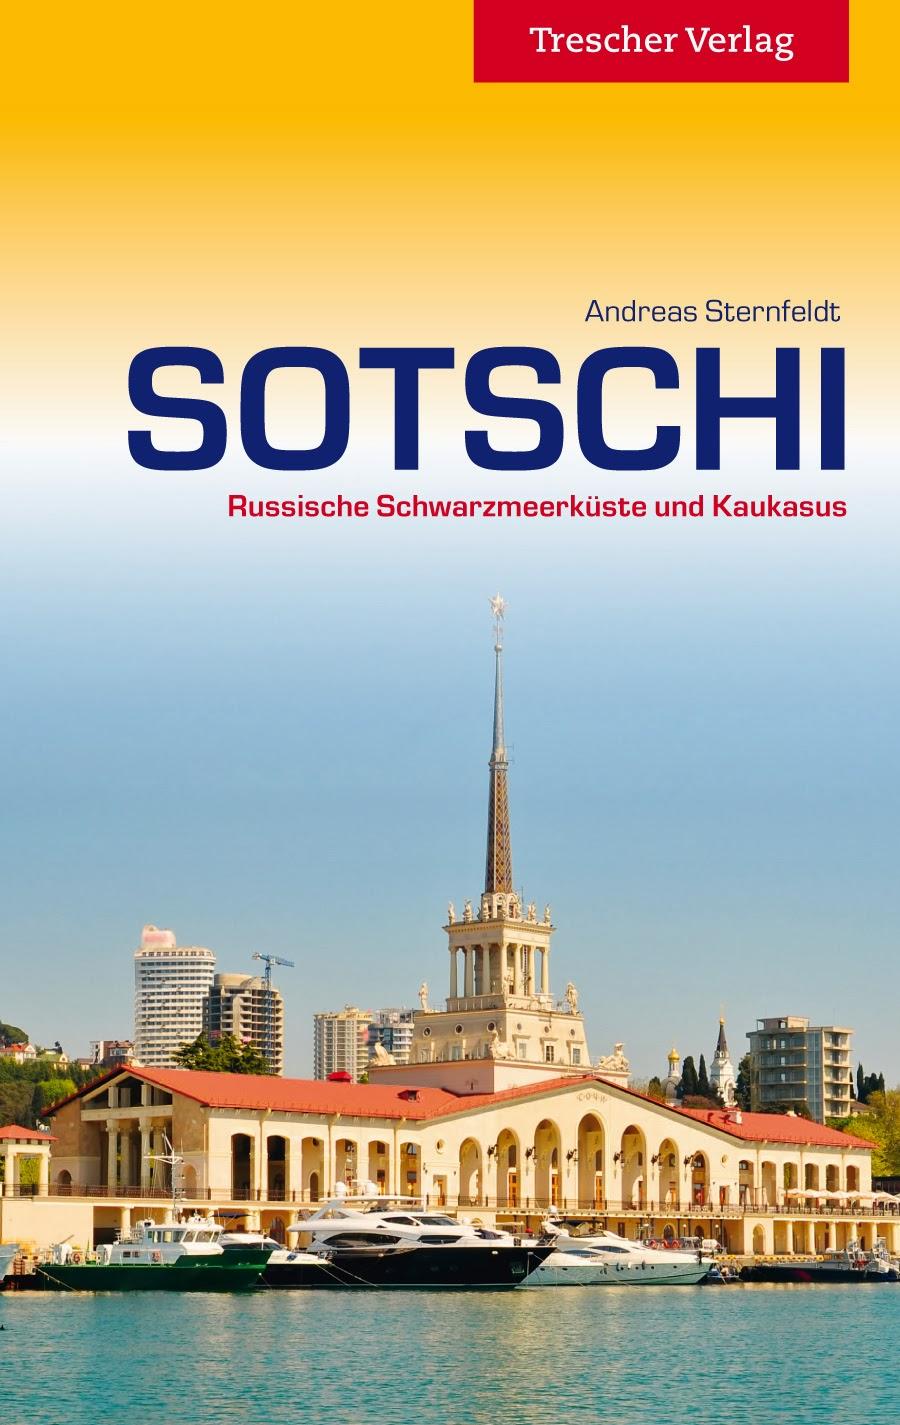 Reisgids Sotschi   Trescher Verlag   Andreas Sternfeldt